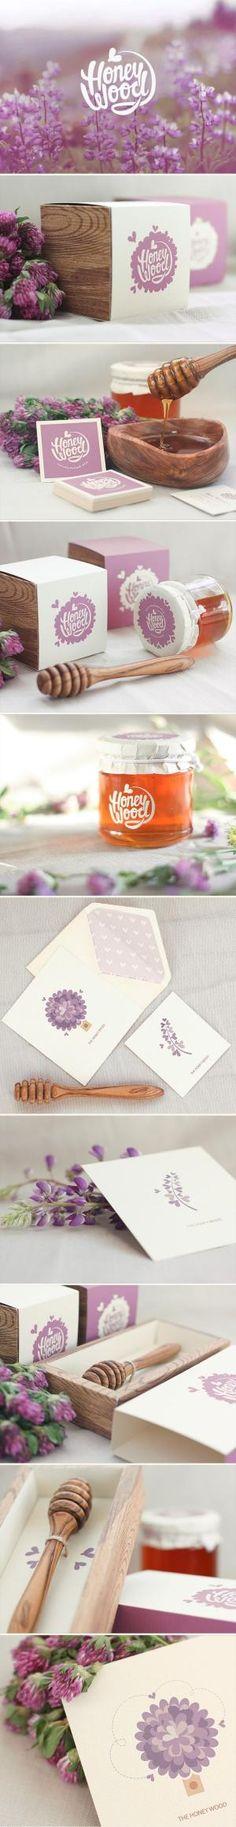 Honey Wood Фирменный стиль © Mari Tropova, Serg Tropov #identity #packaging #branding #marketing PD by lina.sproge